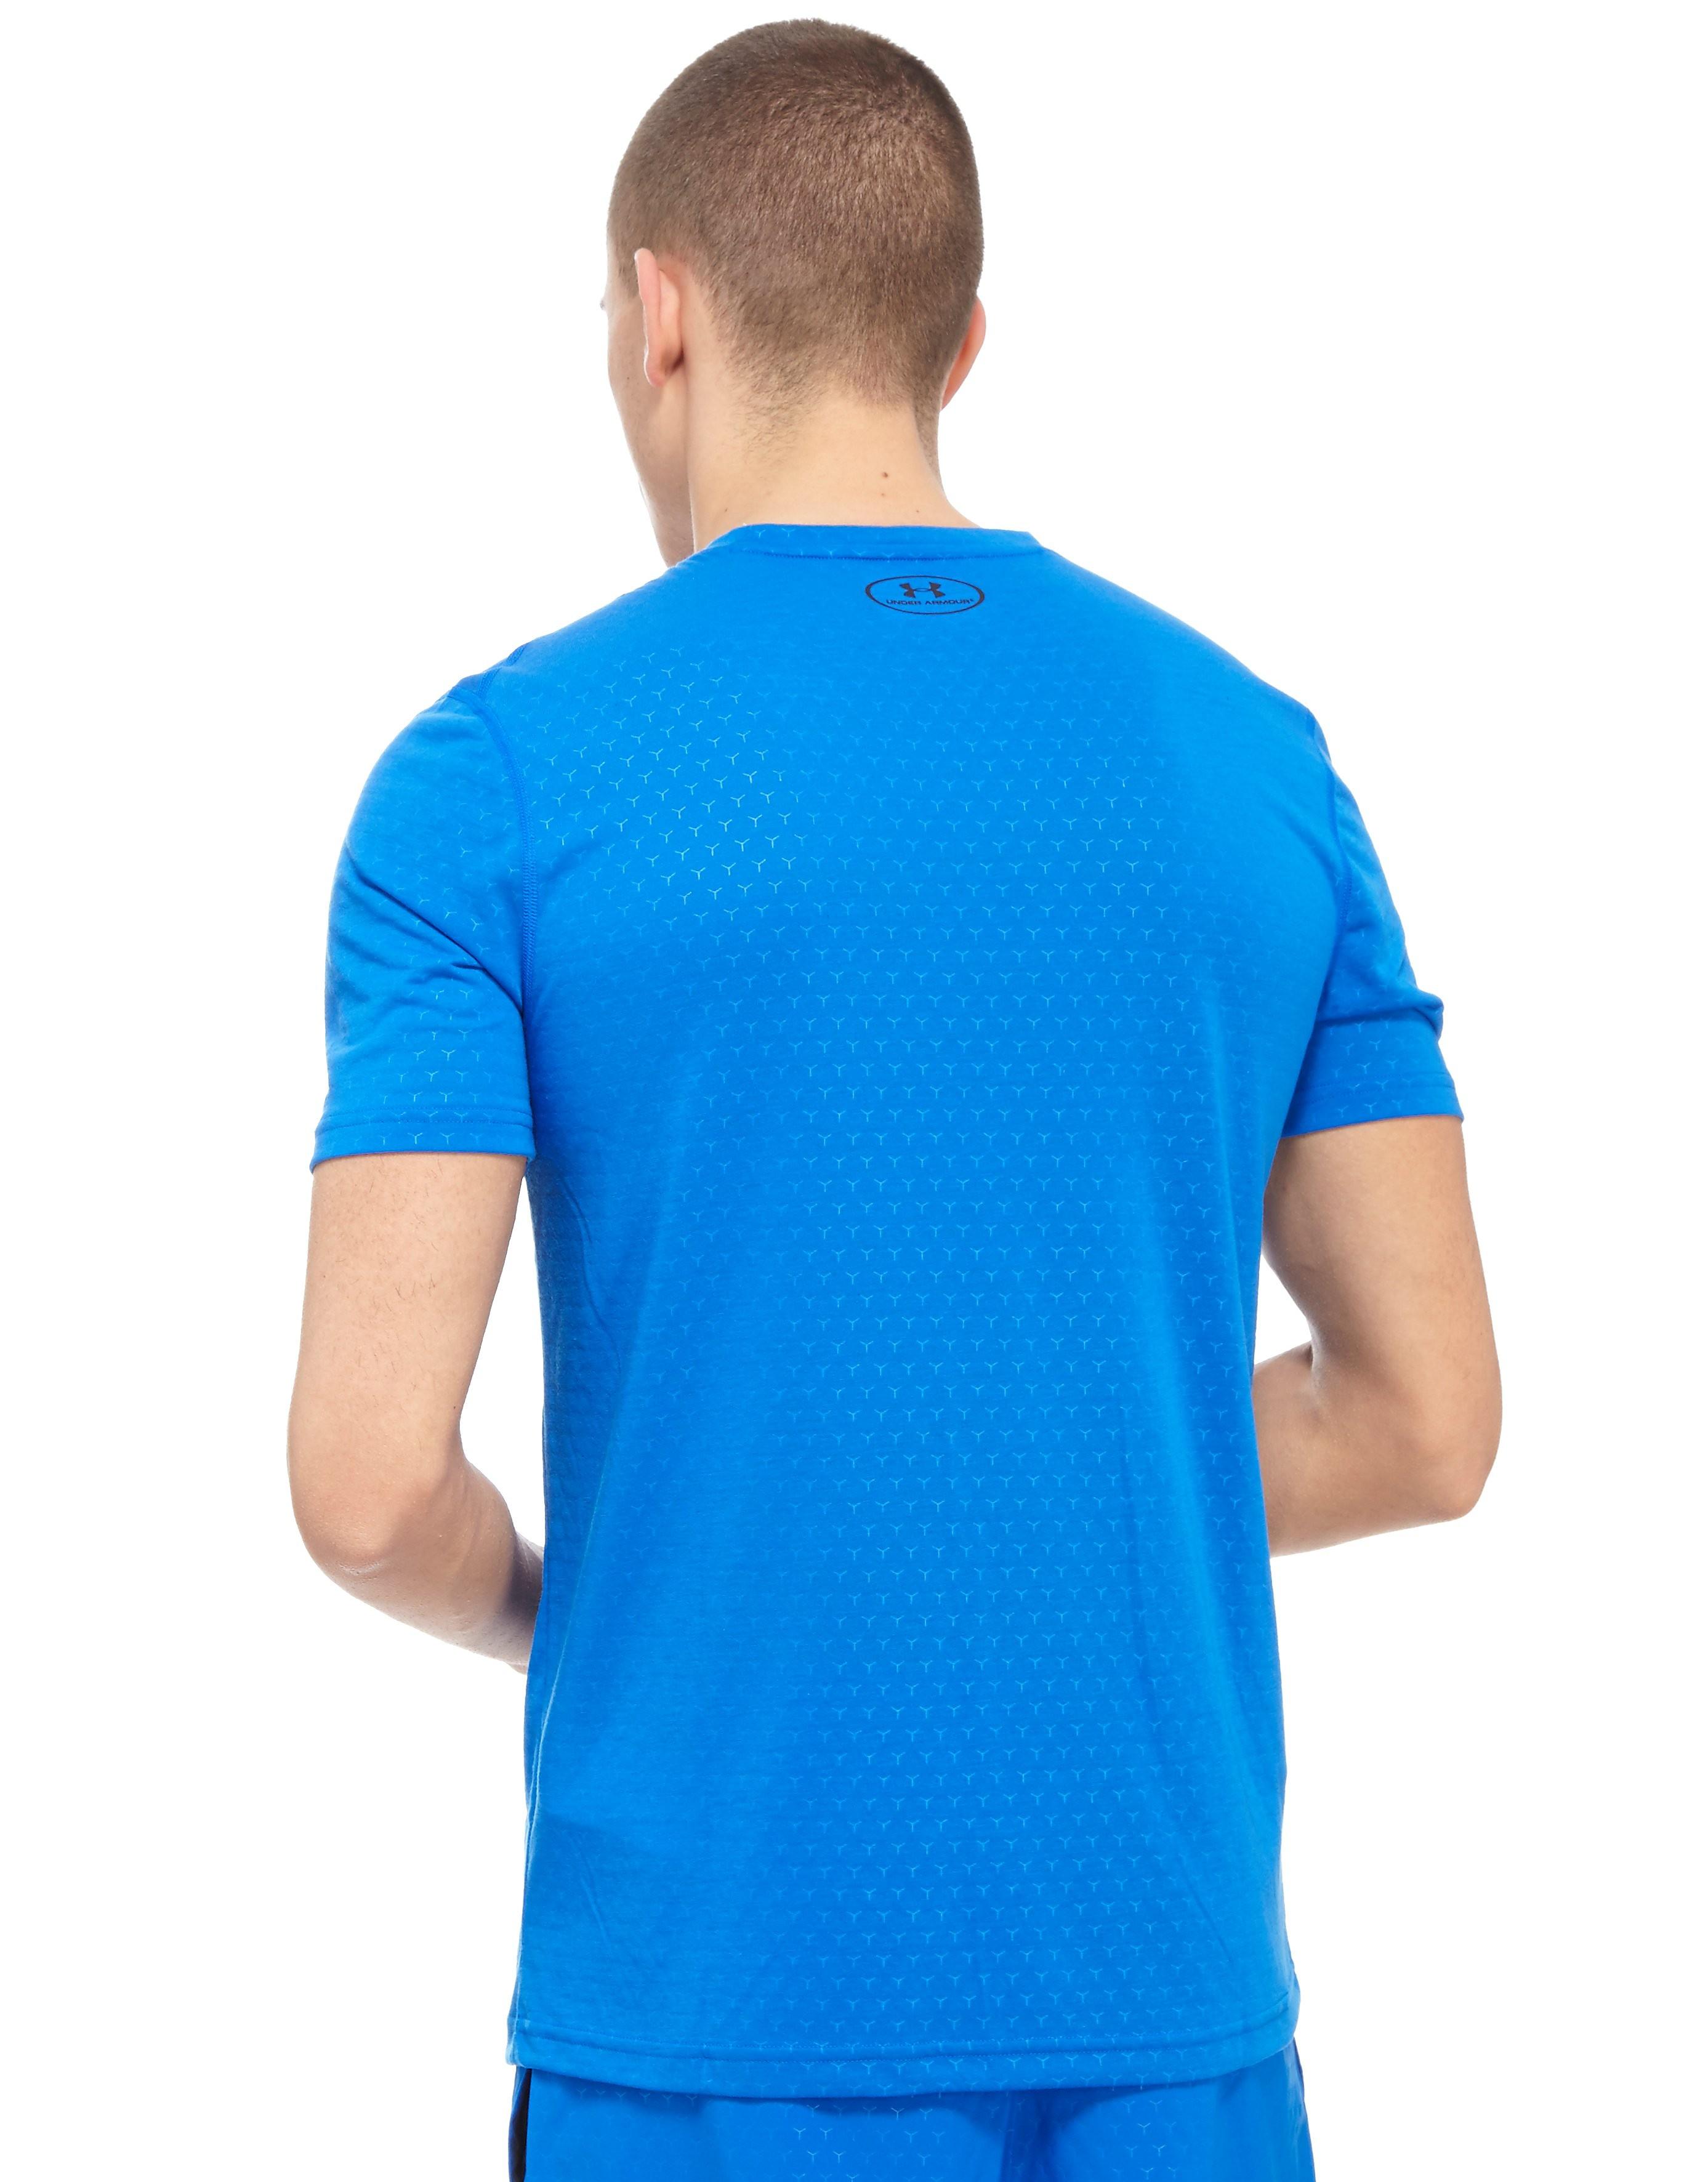 Under Armour Threadborne Siro Embossed T-Shirt